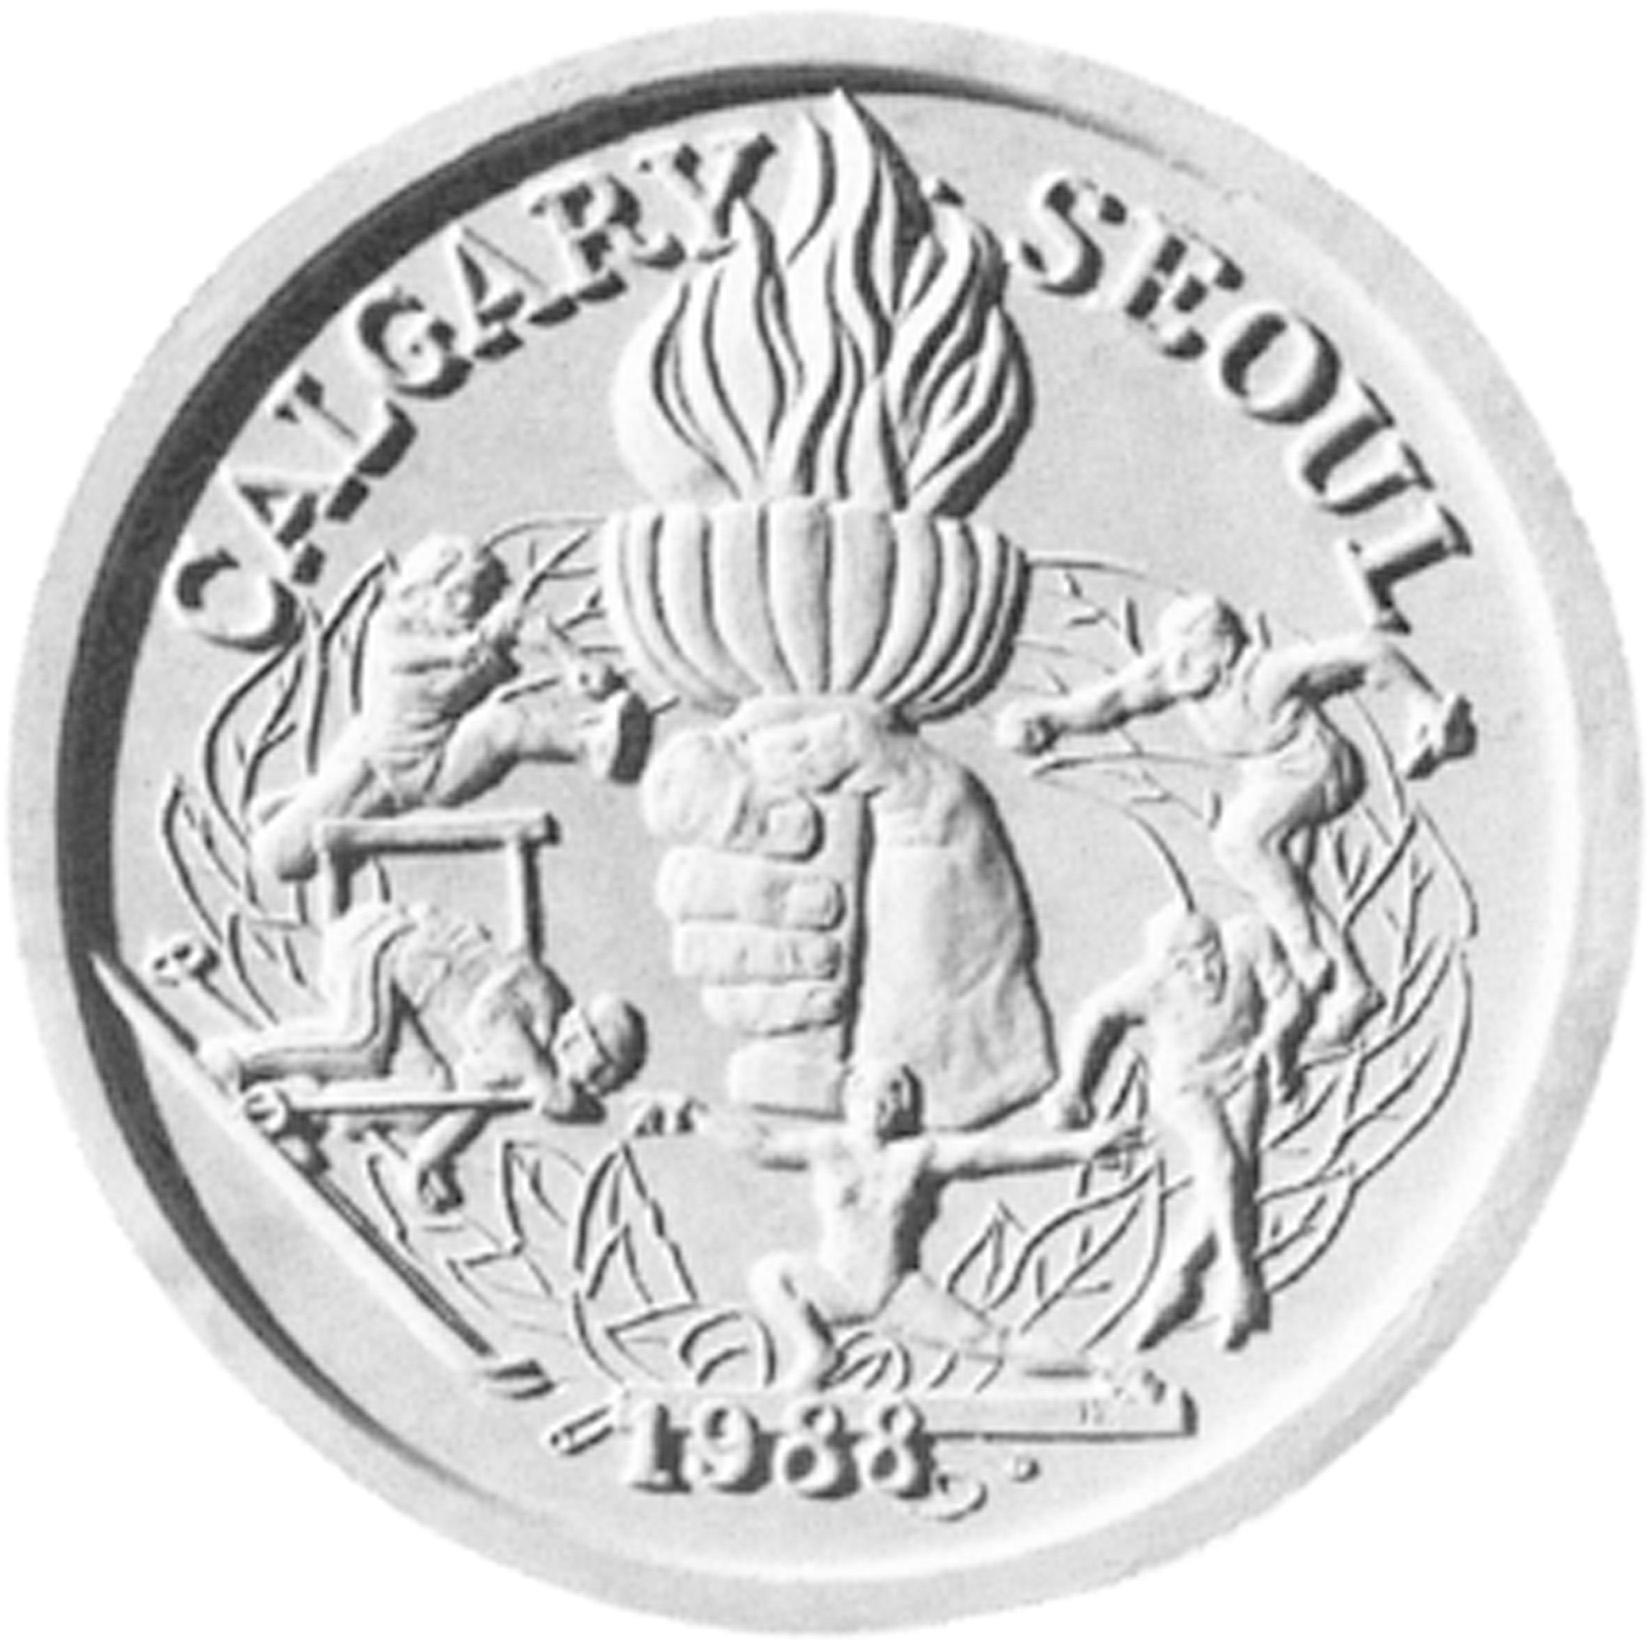 1988 Hutt River Province 100 Dollars obverse